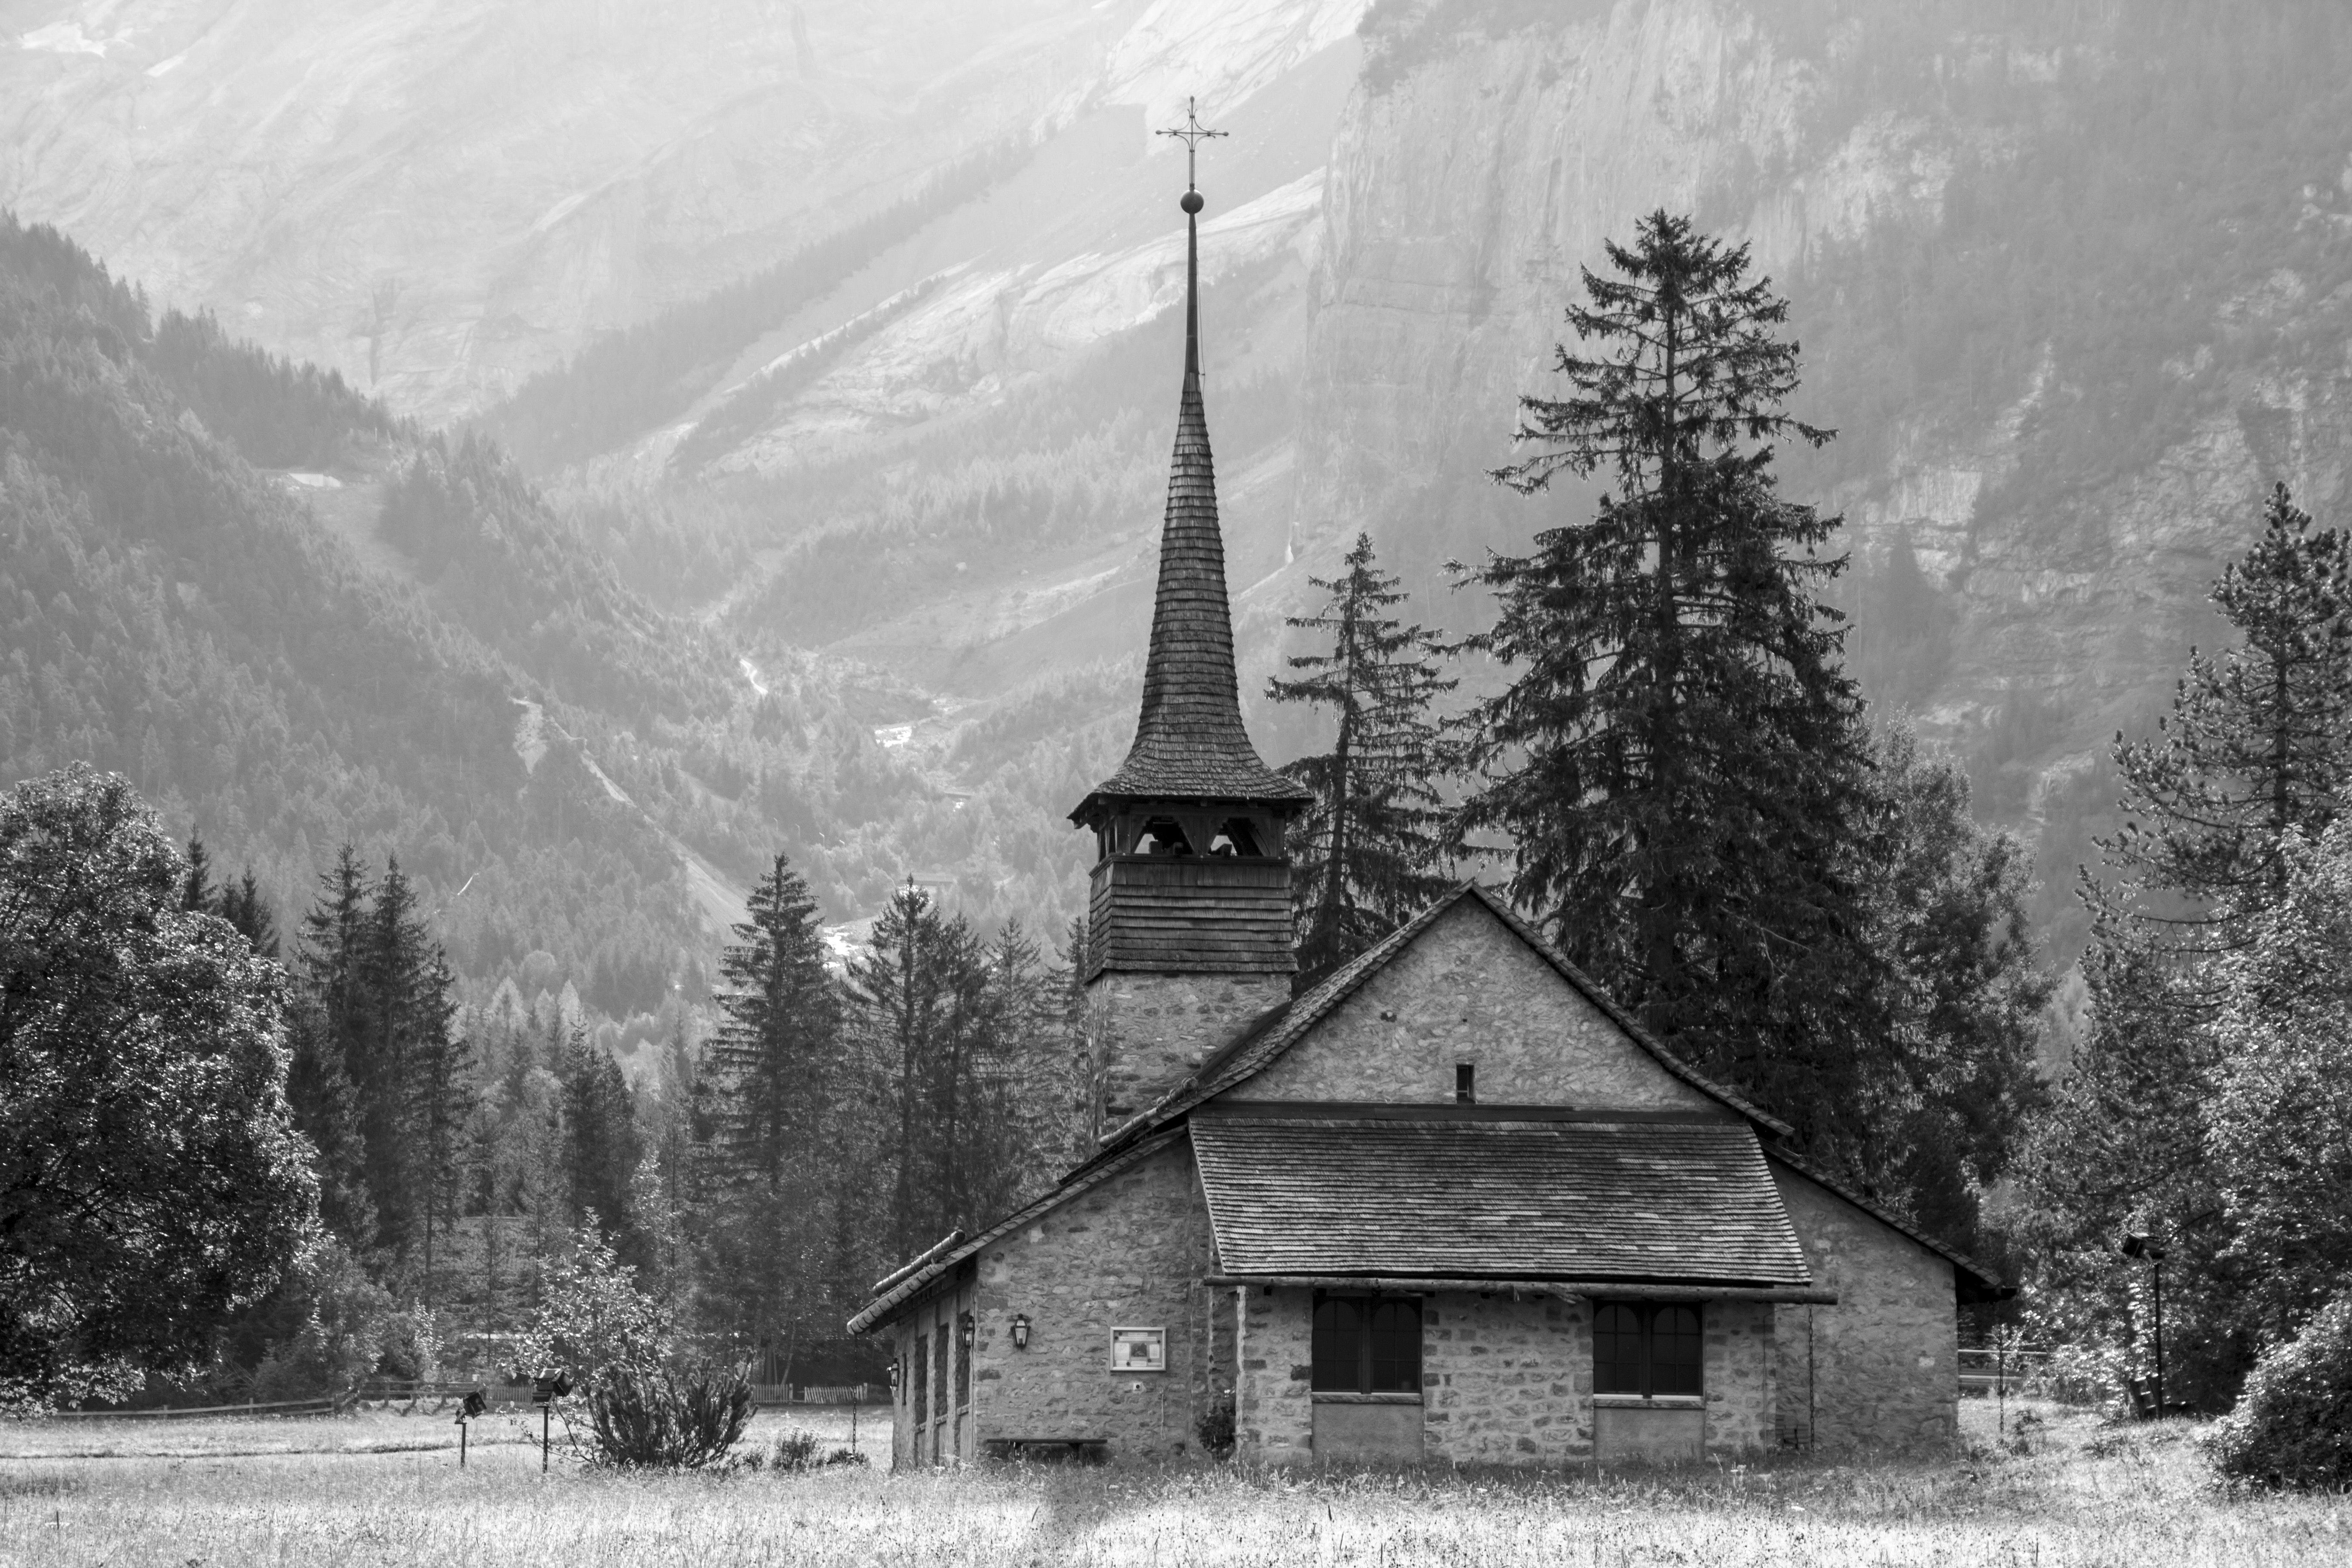 Church in the Open Field Near the Mountain, Mountain, Trees, Fog, Church, HQ Photo